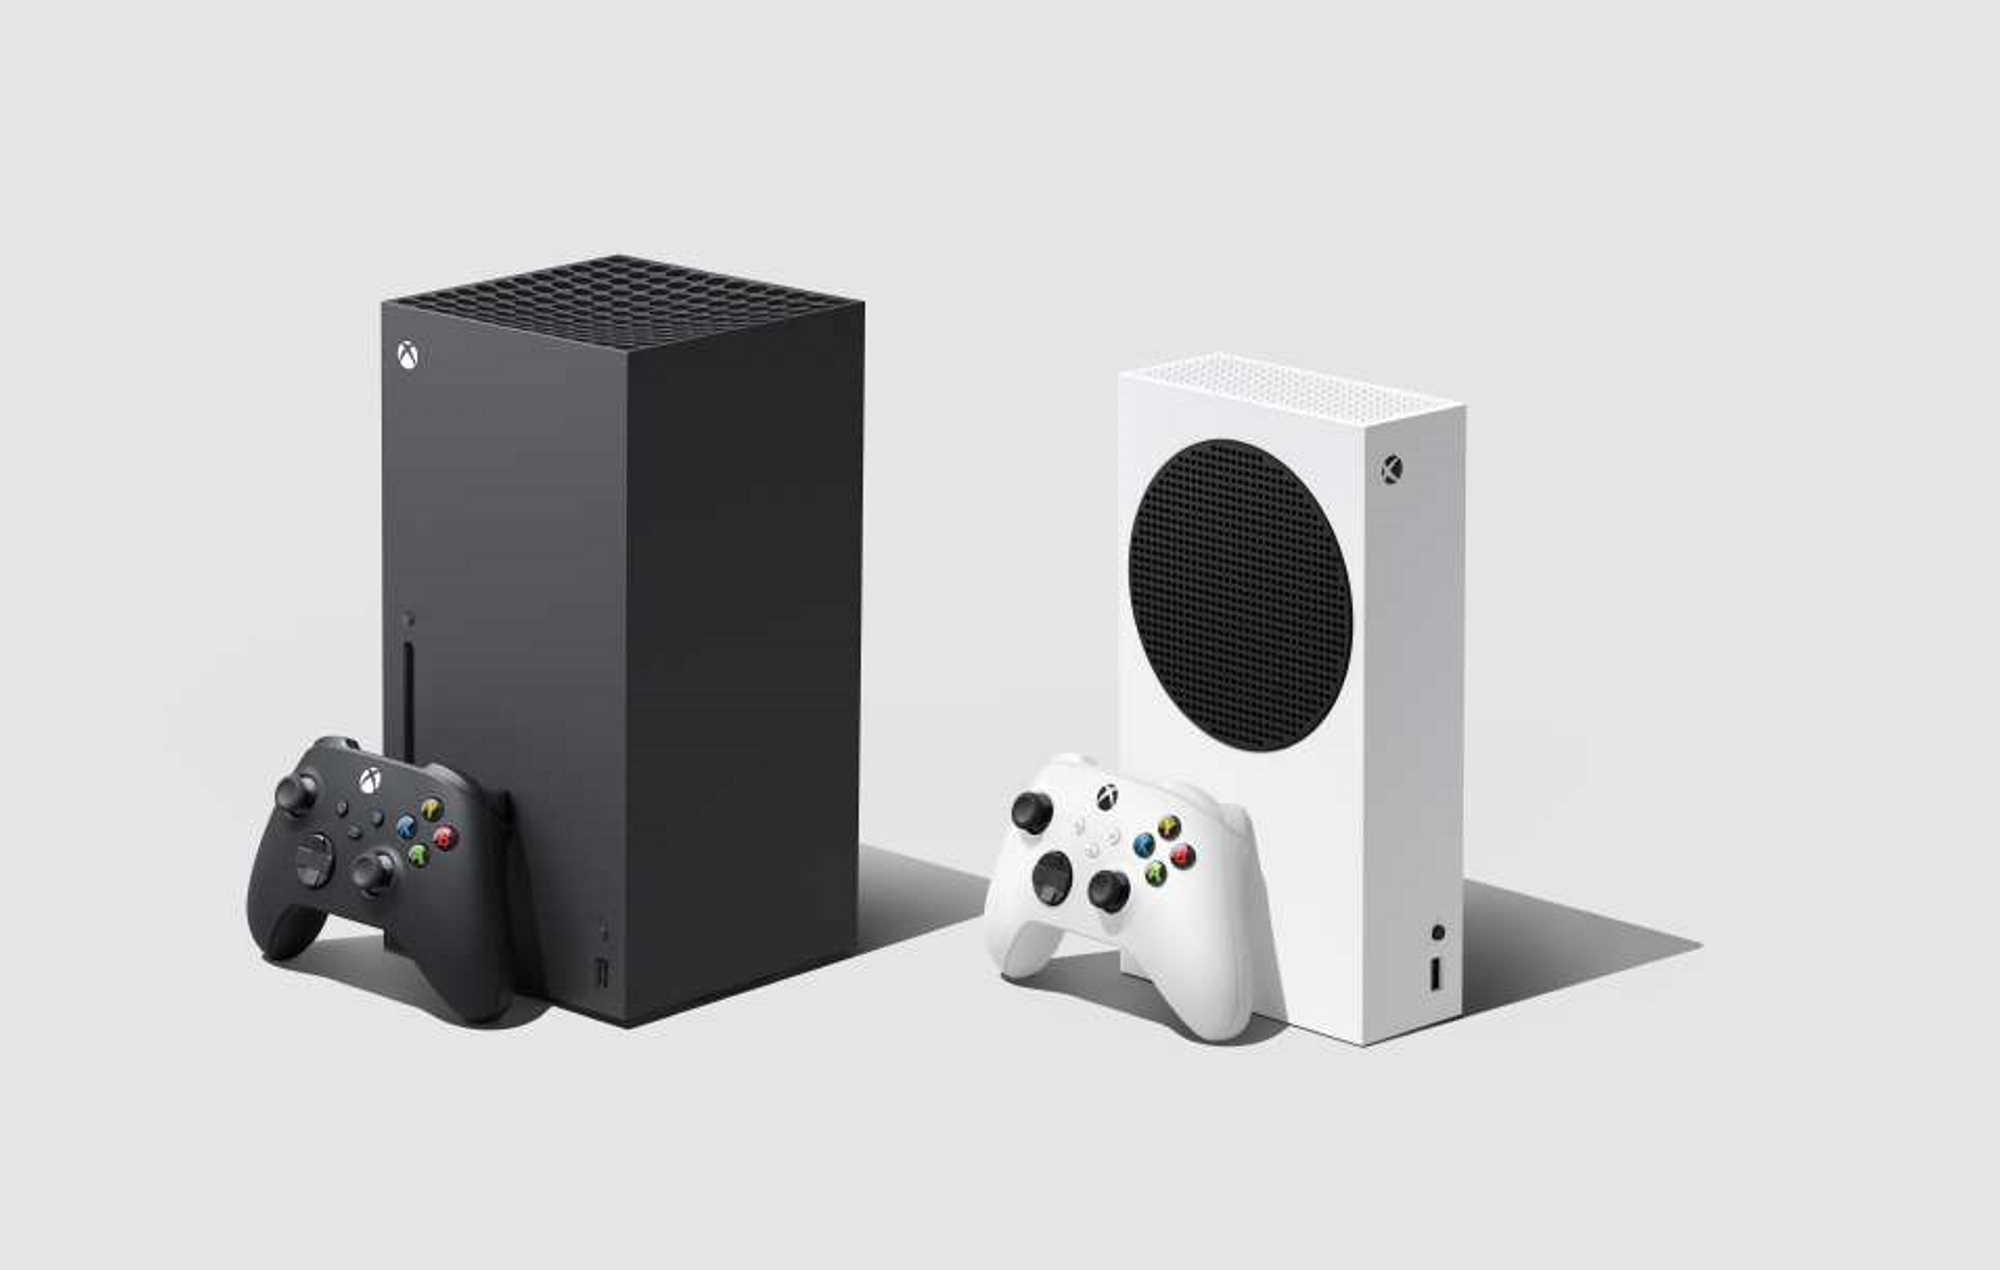 Xbox Series S and Xbox Series X